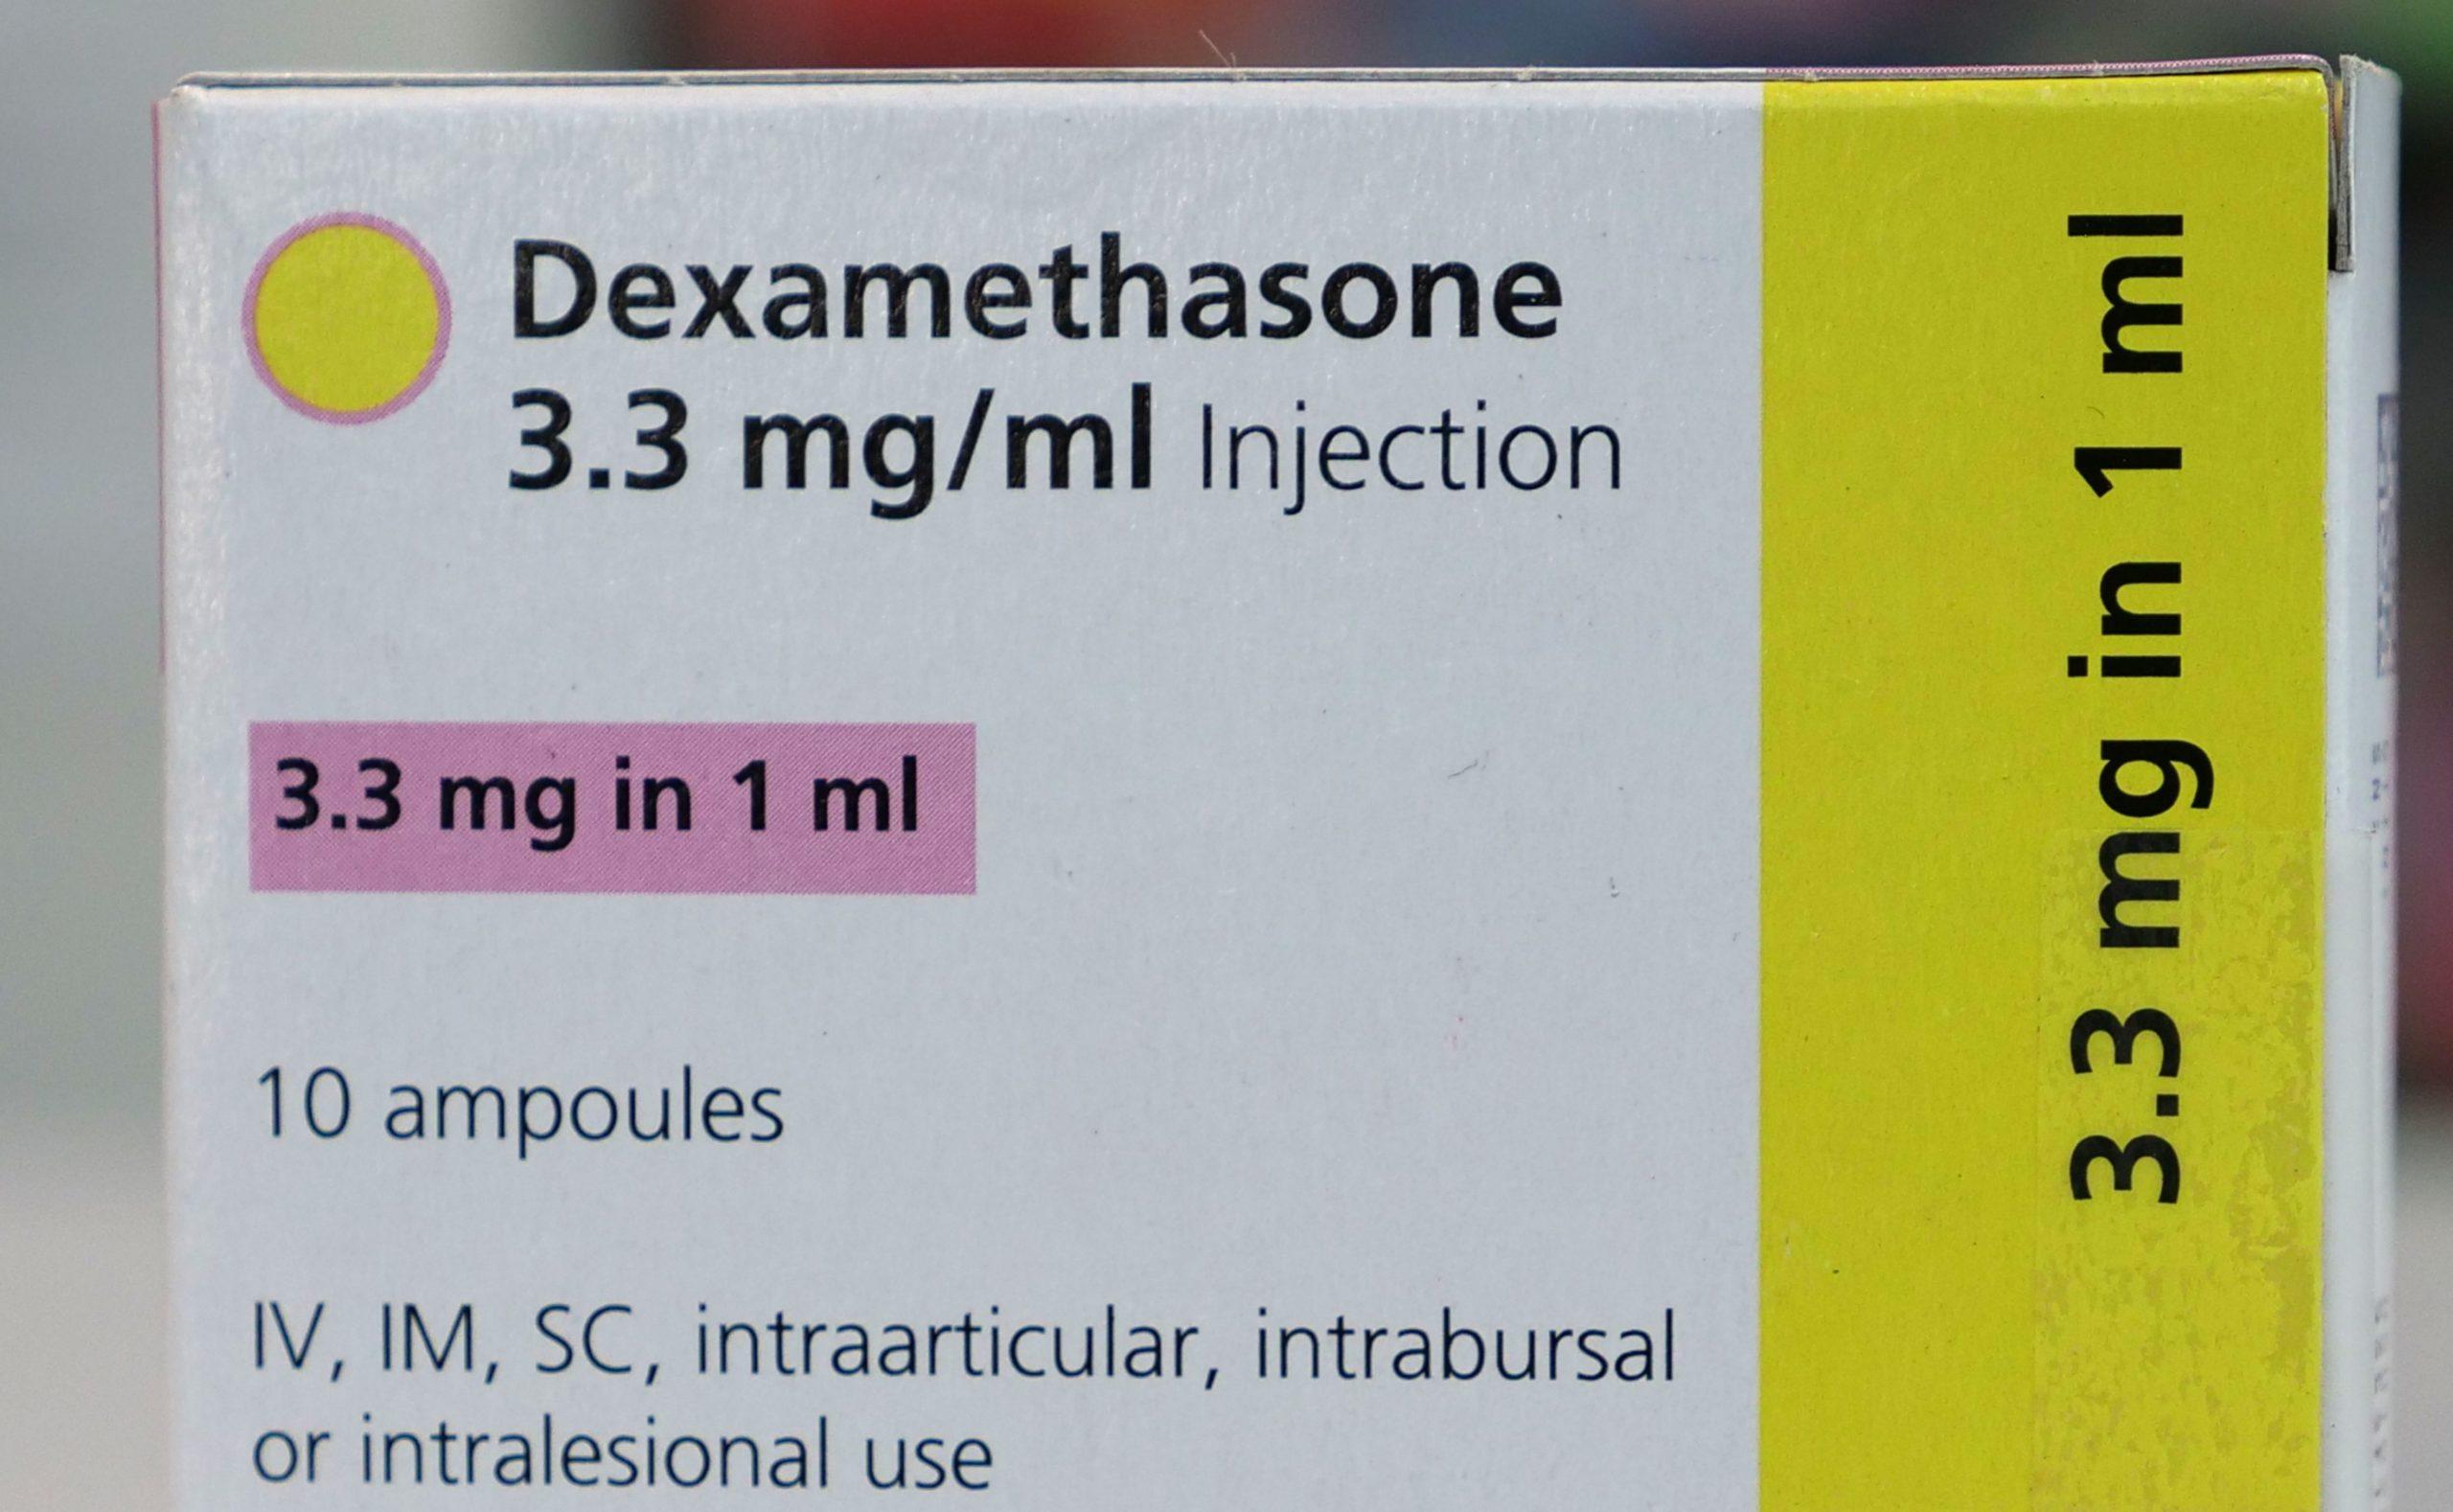 box of dexamethasone drug